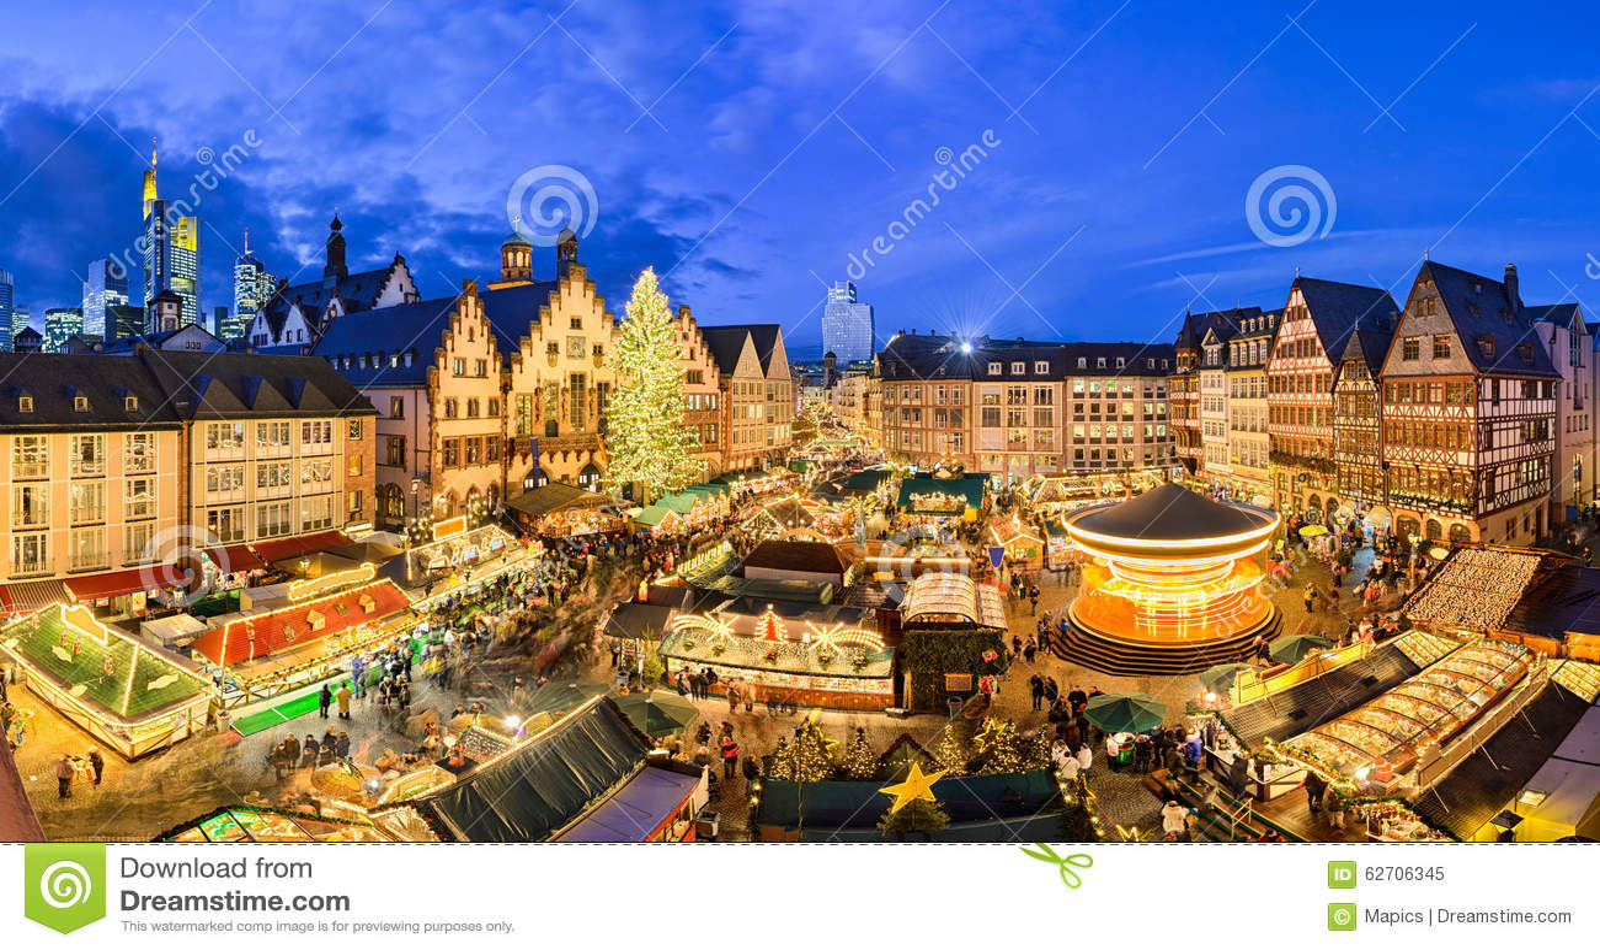 Weihnachtsmarkt Frankfurt Main.Christmas Market In Frankfurt Germany Stock Image Image Of